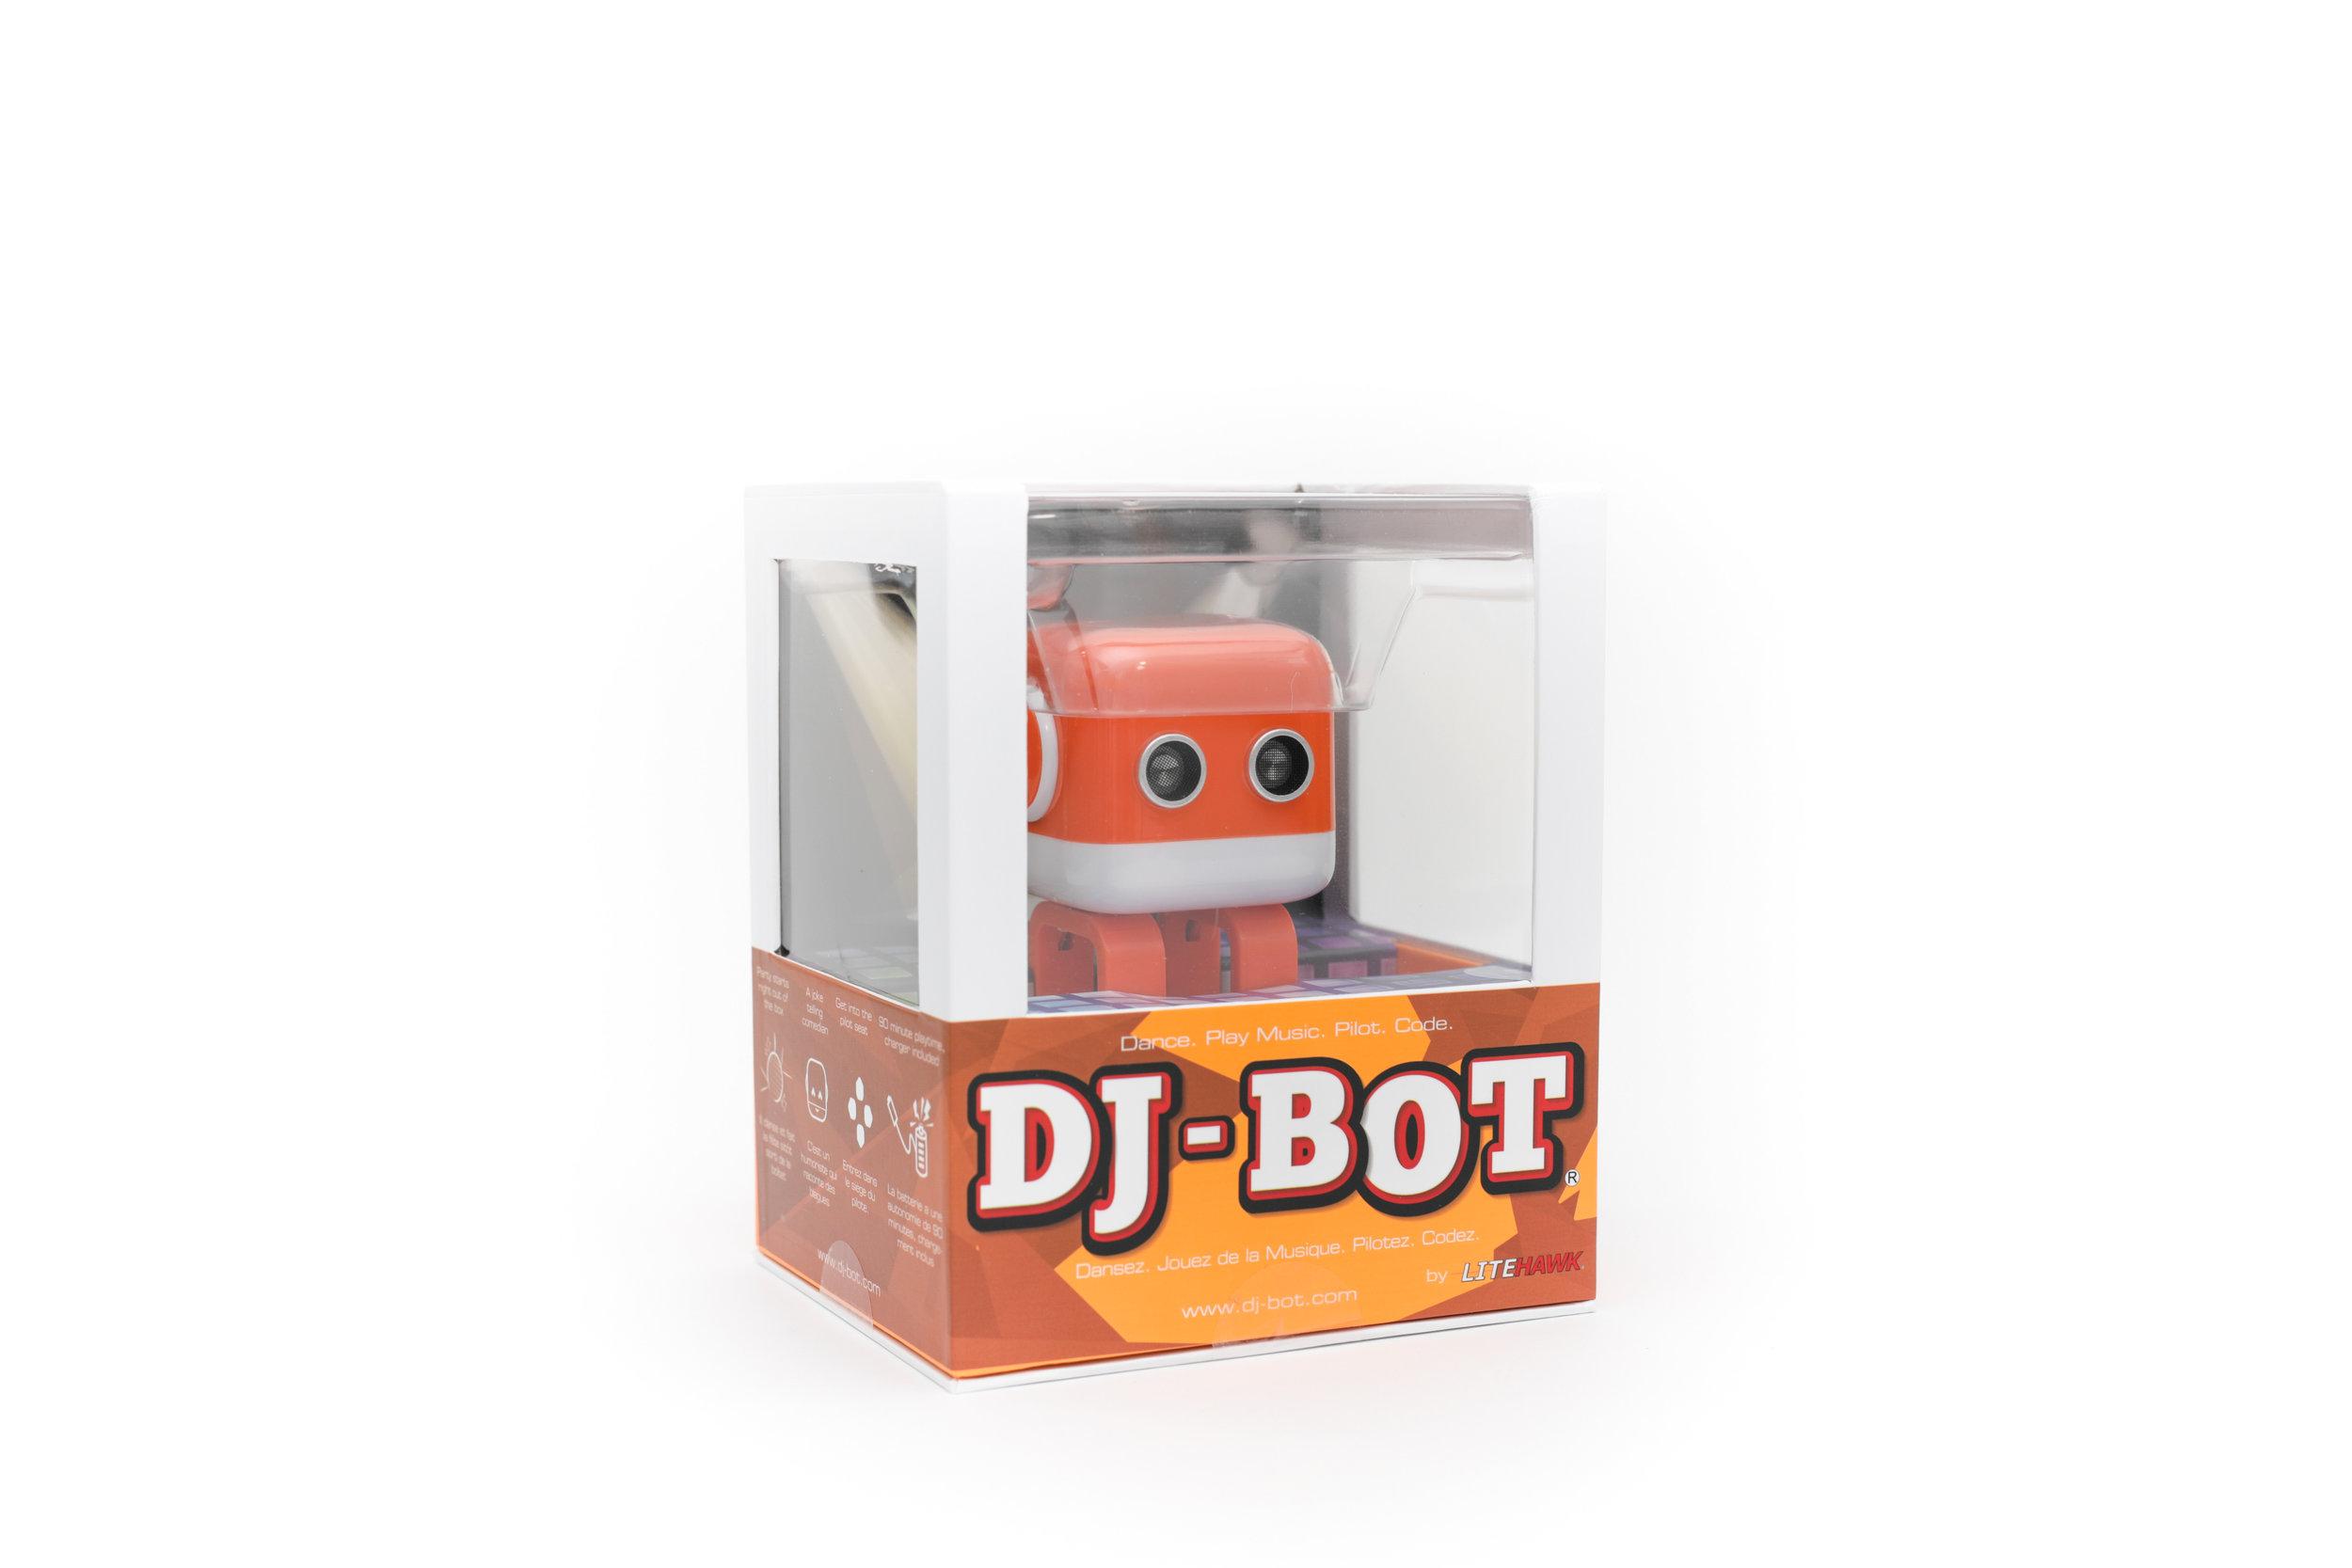 DJ BOT Box (2 of 6).jpg